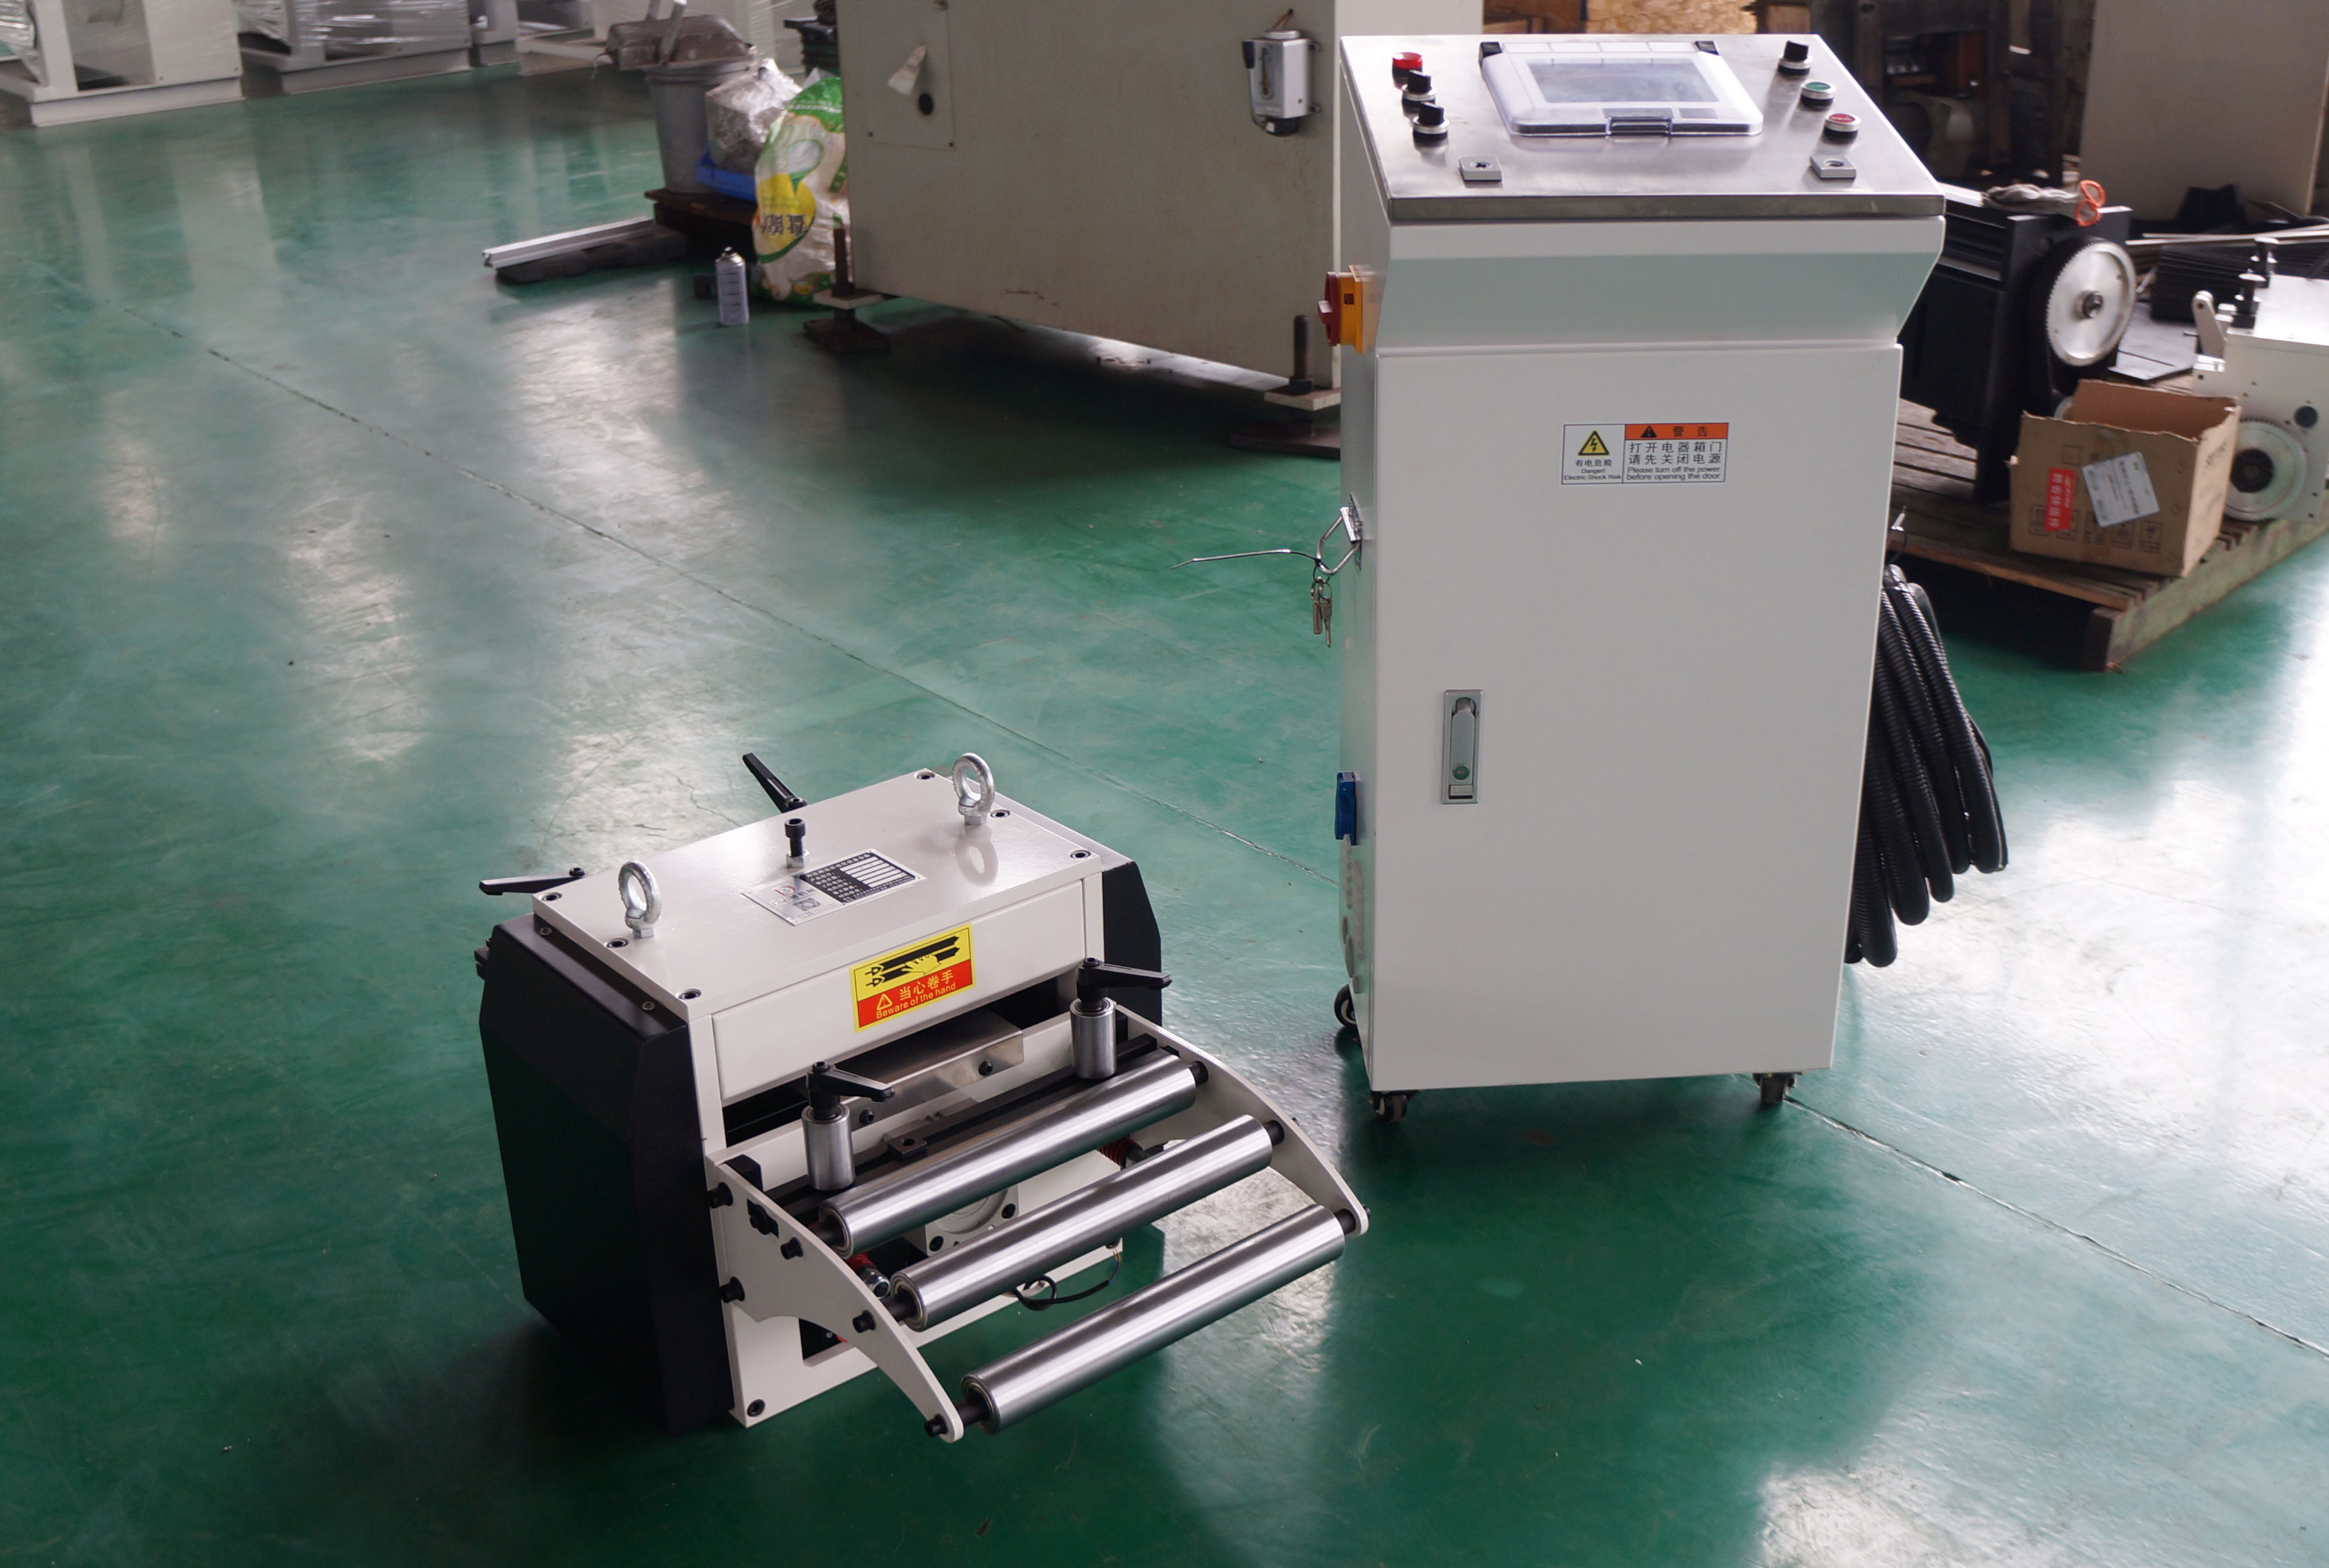 NC数控送料机,NC送料机,伺服送料机,数控送料机